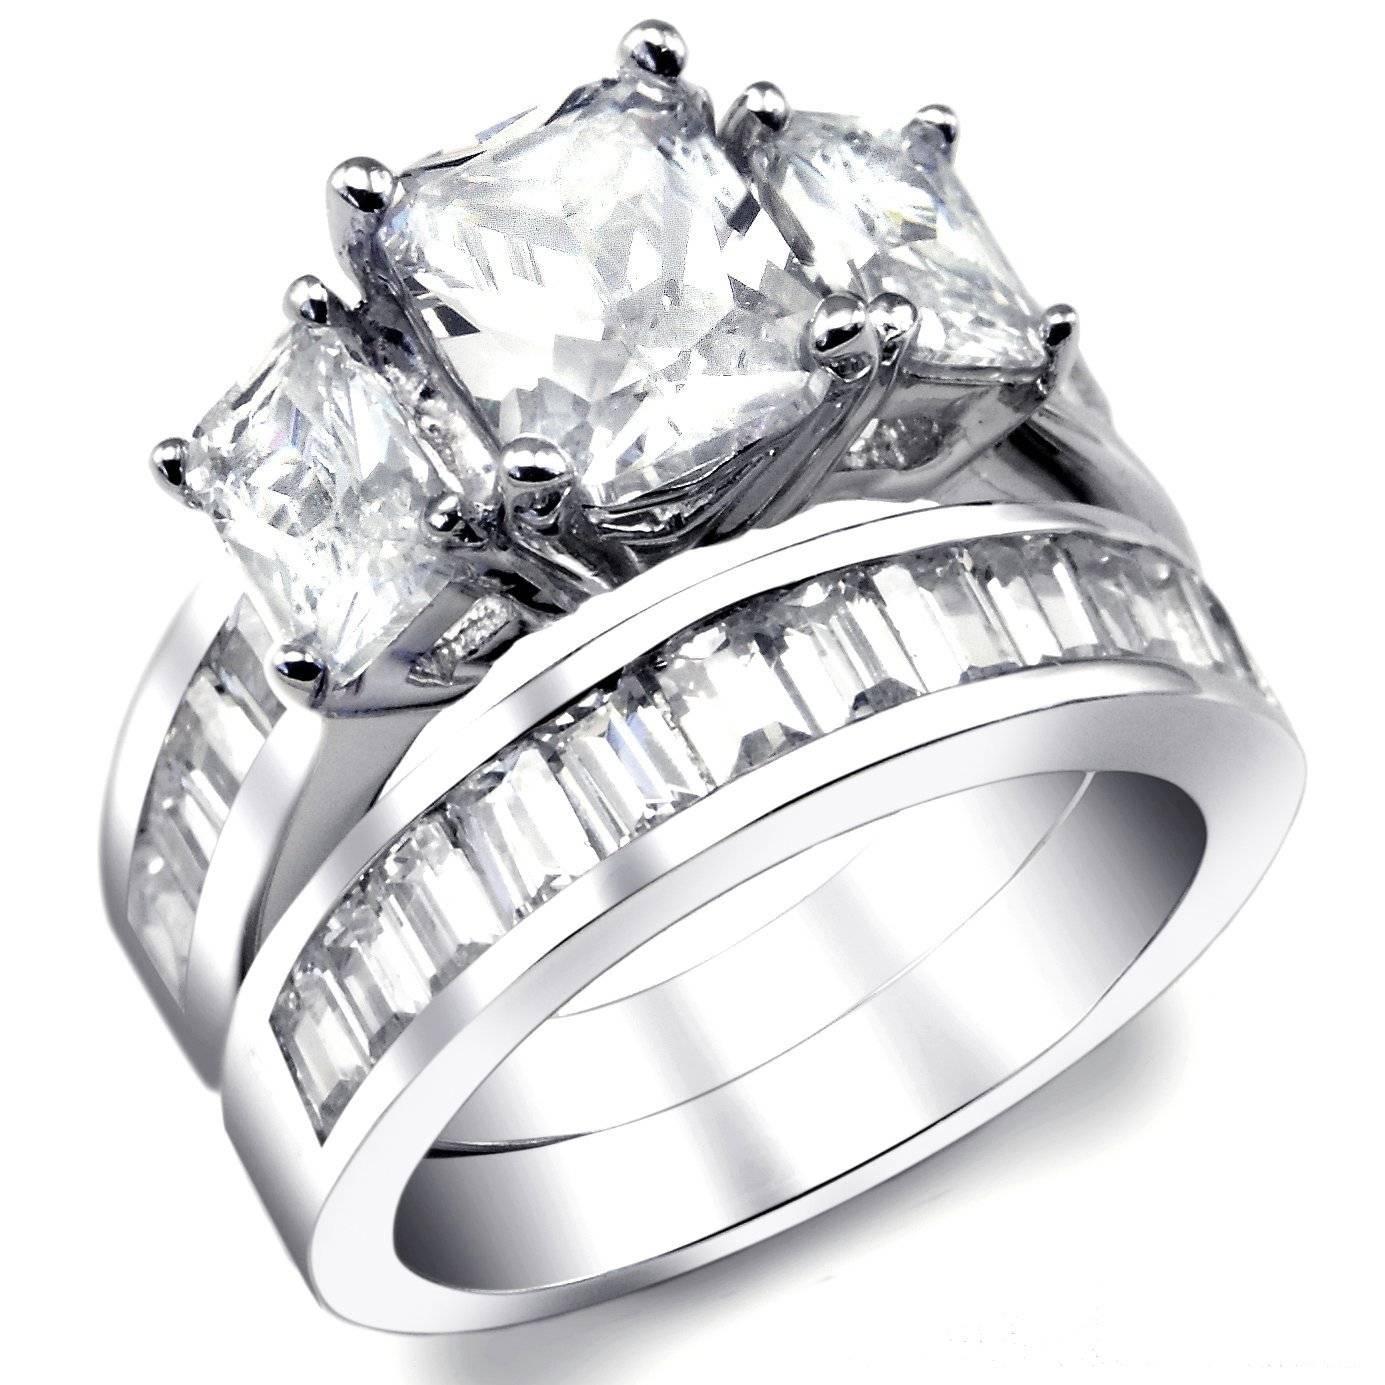 15 Ideas Of Unique Womens Wedding Rings